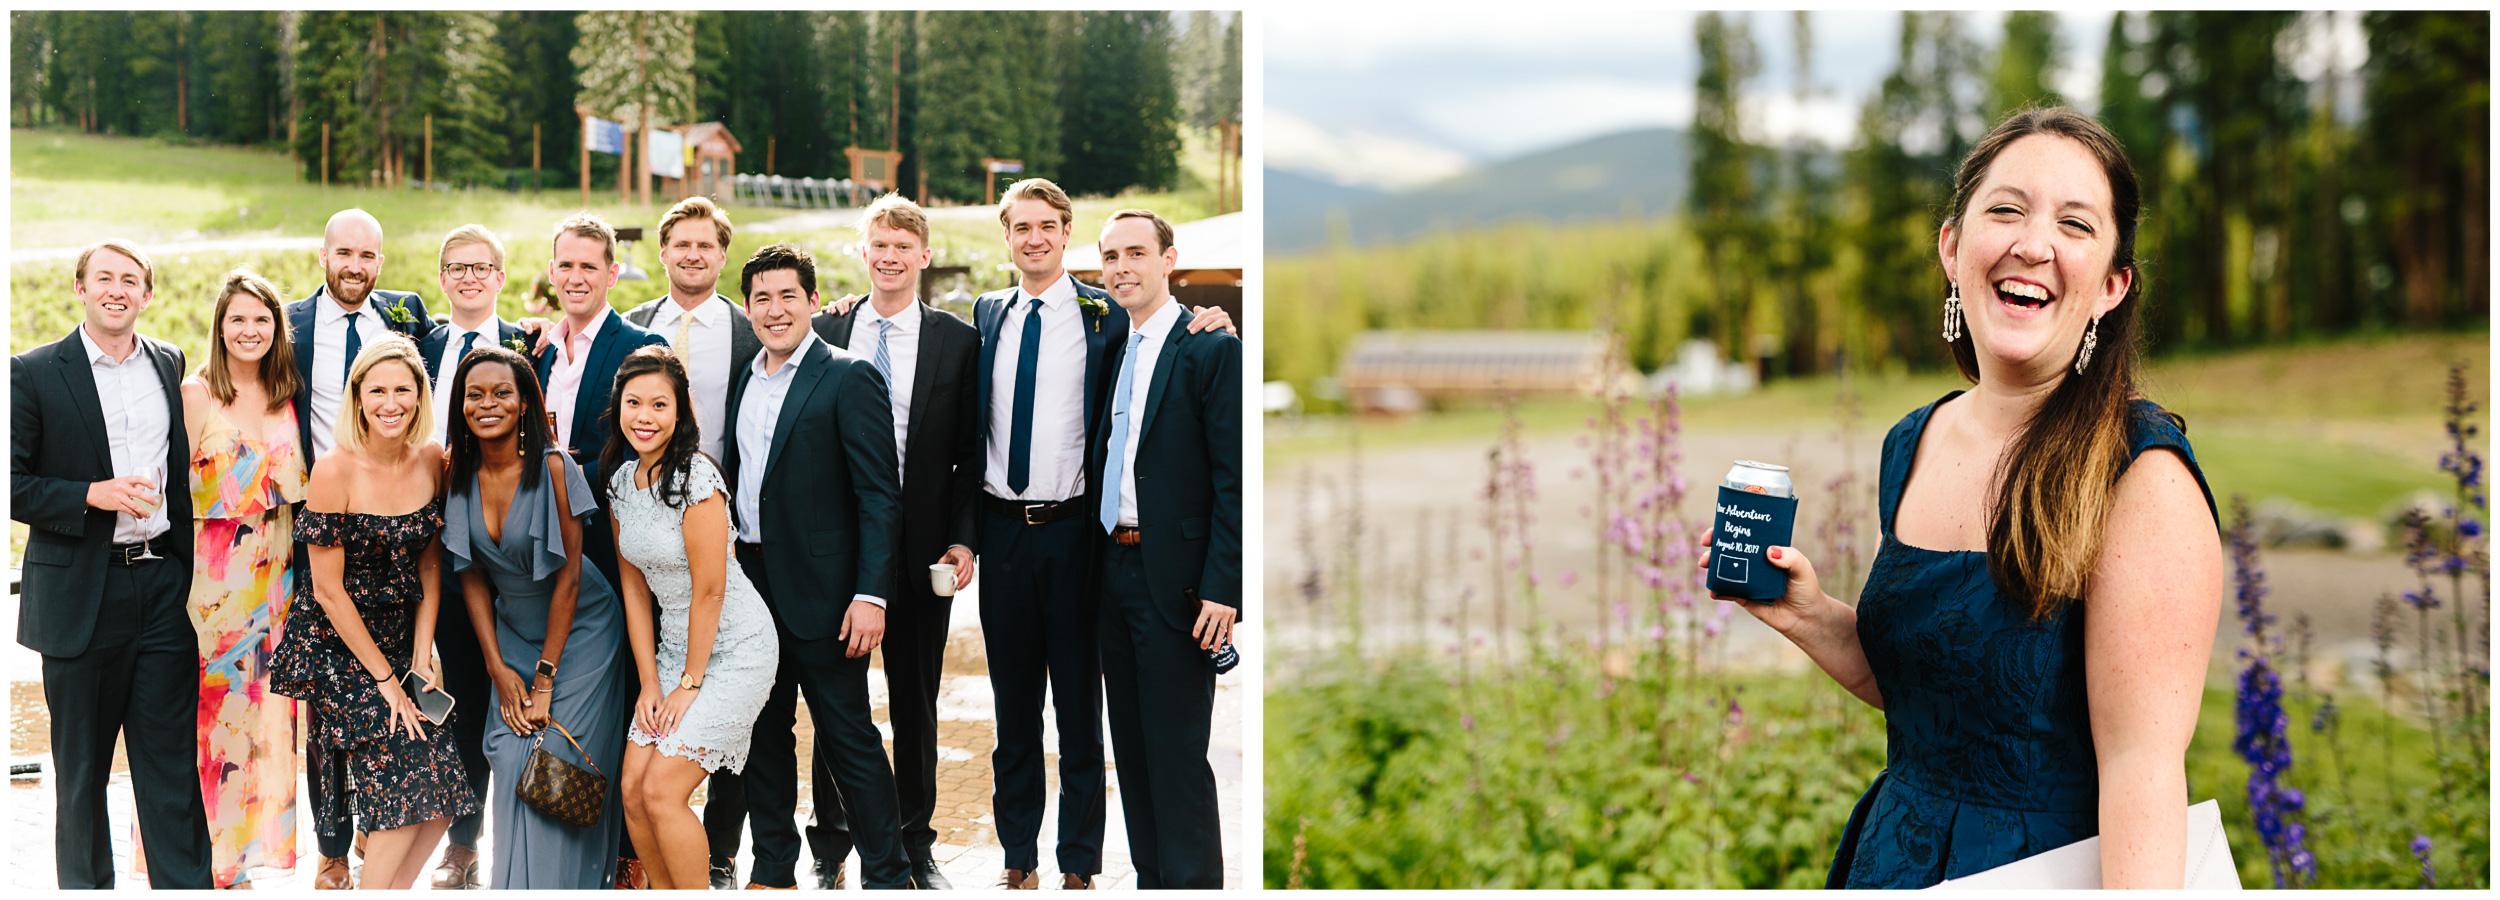 breckenridge_wedding_63.jpg